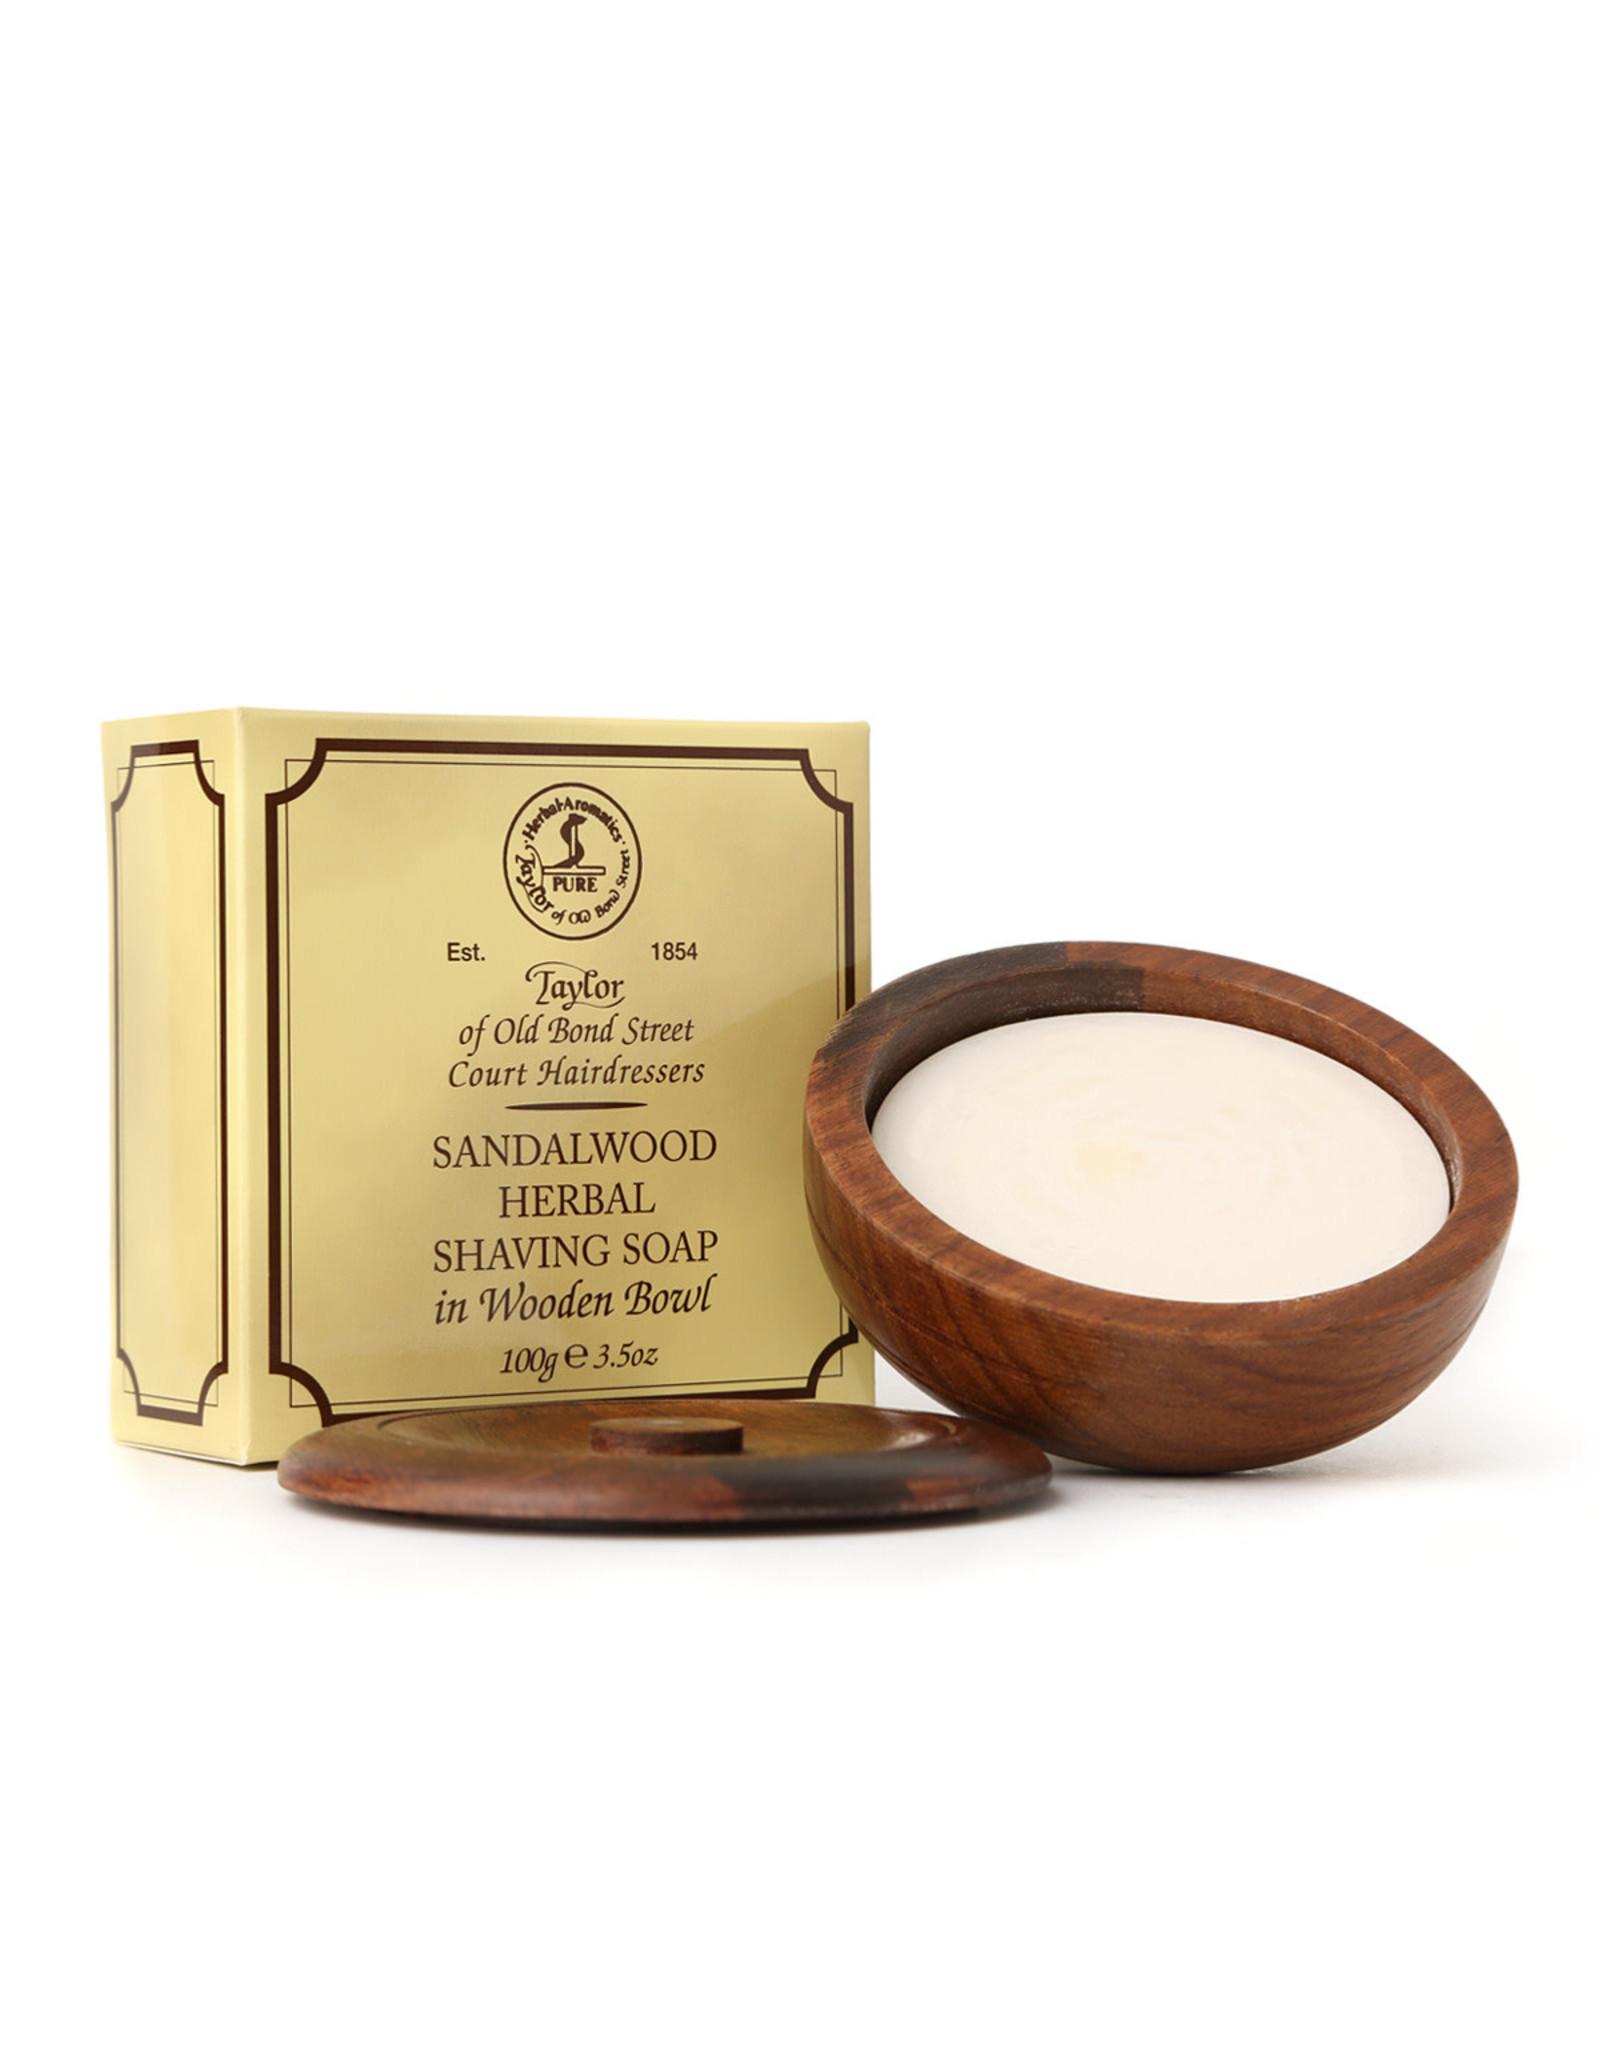 Taylor of Old Bond Street Sandalwood Shaving Soap 100g incl. Wooden Bowl